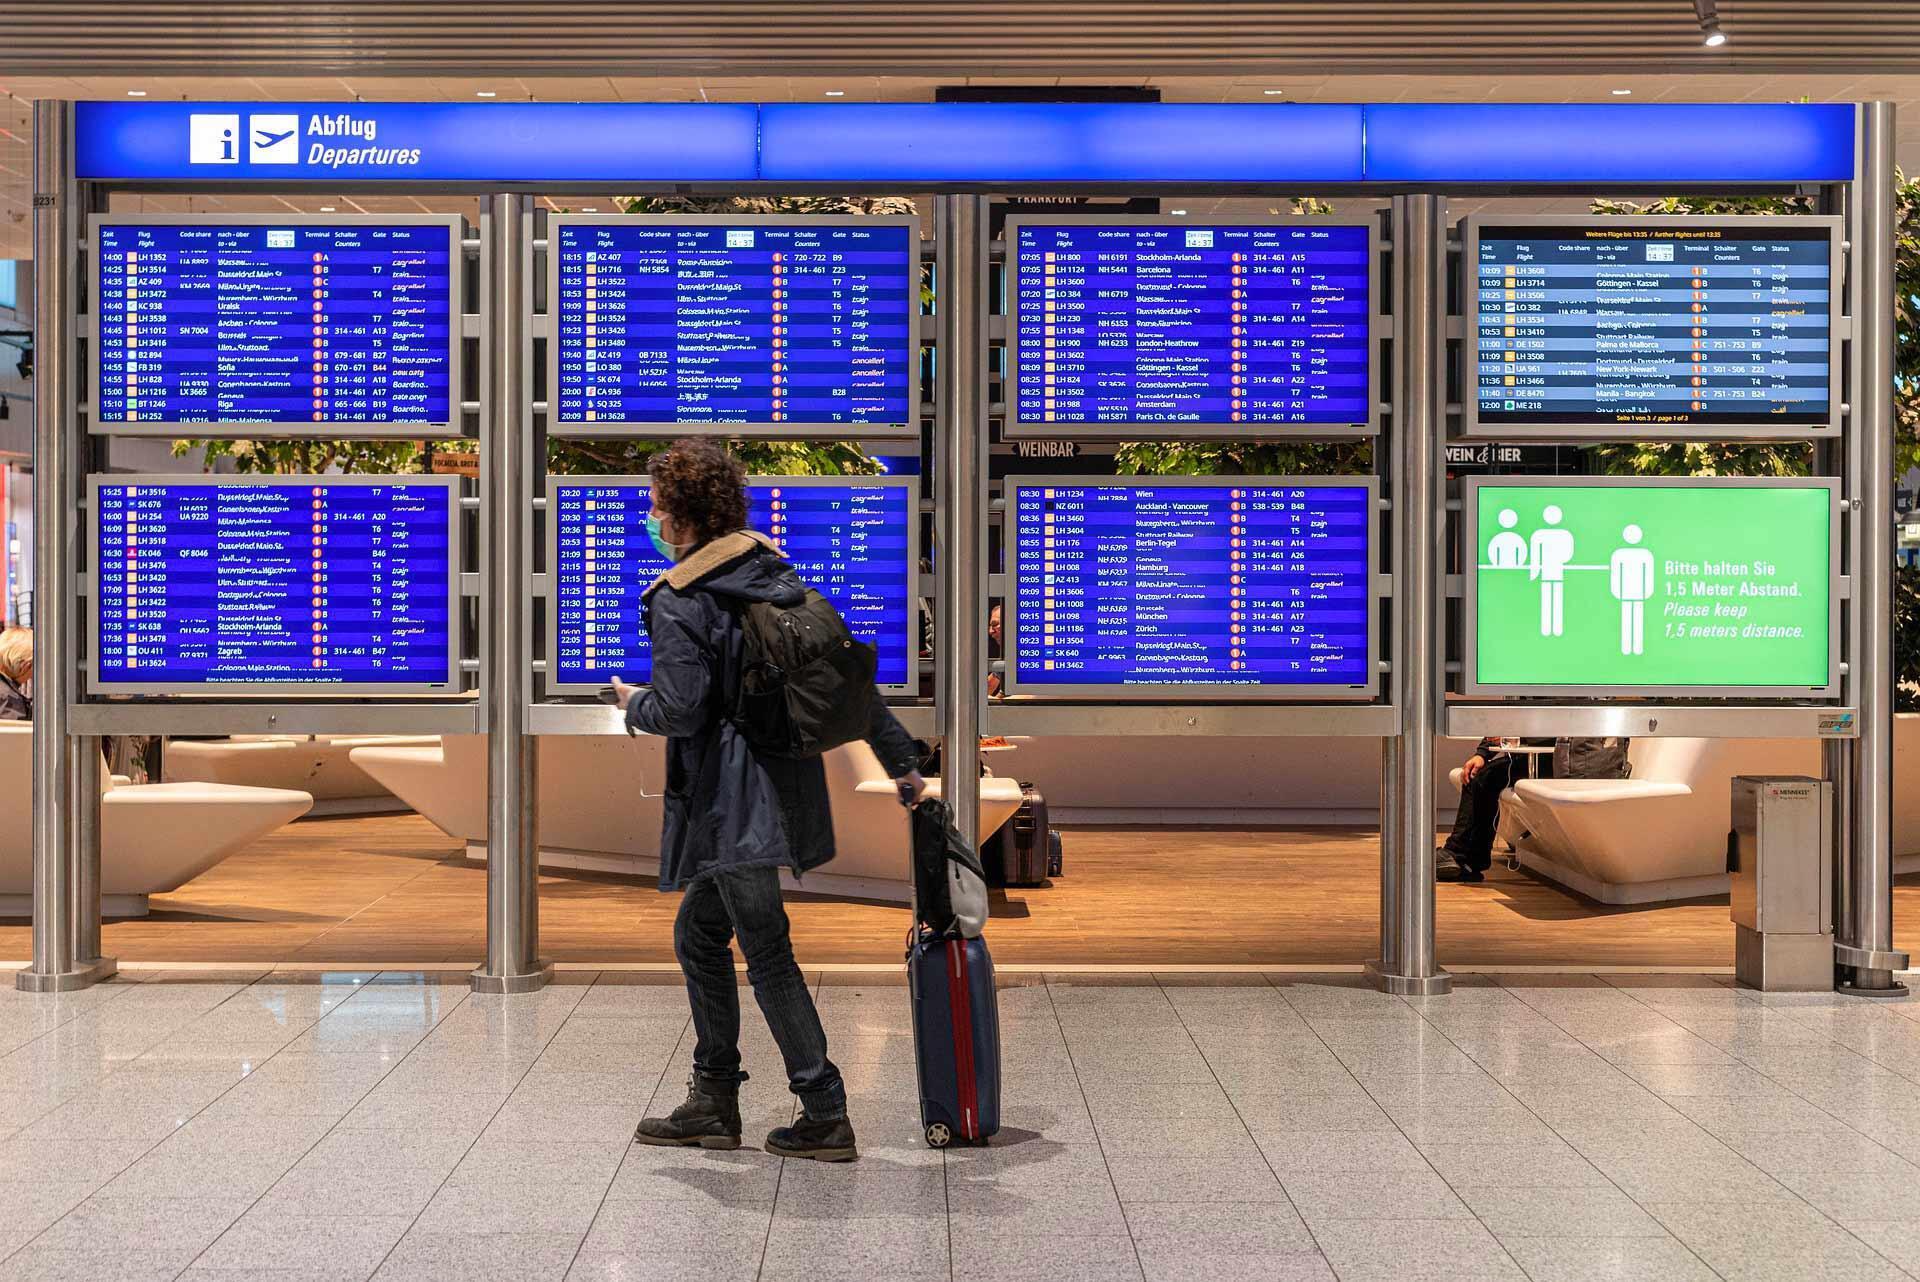 airport-coronavirus-transport-avion-voyage-aéroport